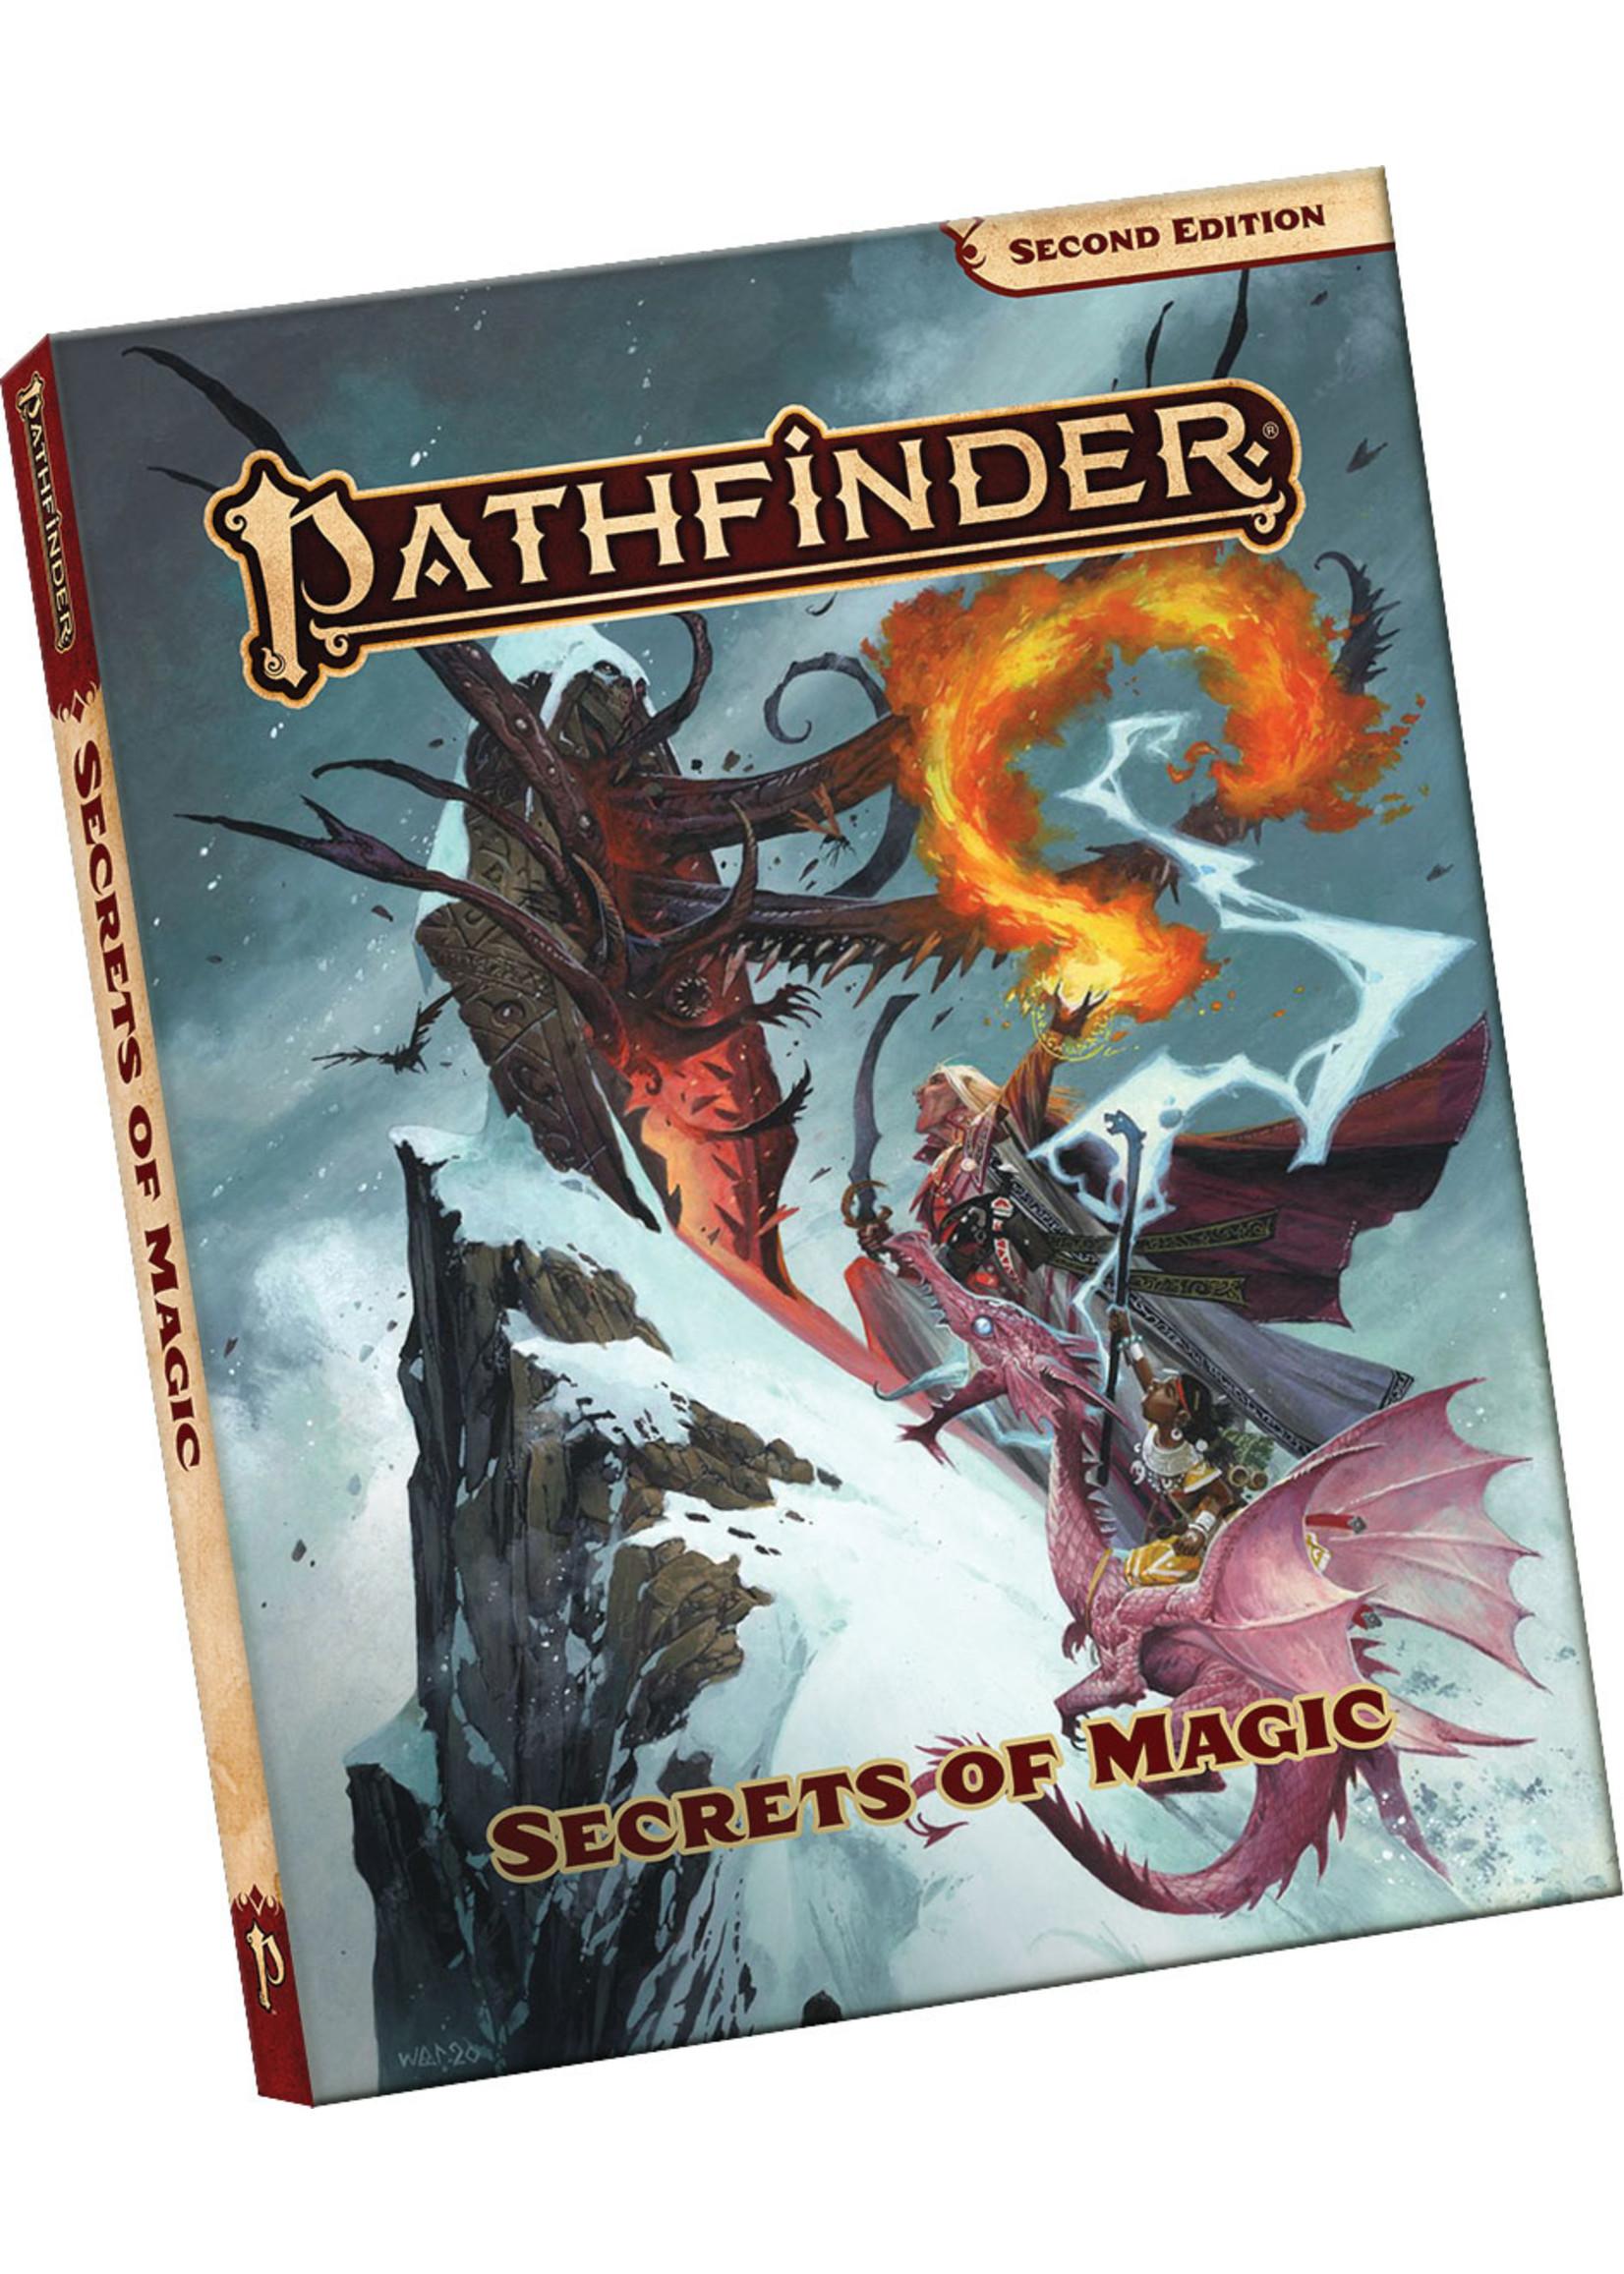 Pathfinder Secrets of Magic (Pocket Edition)